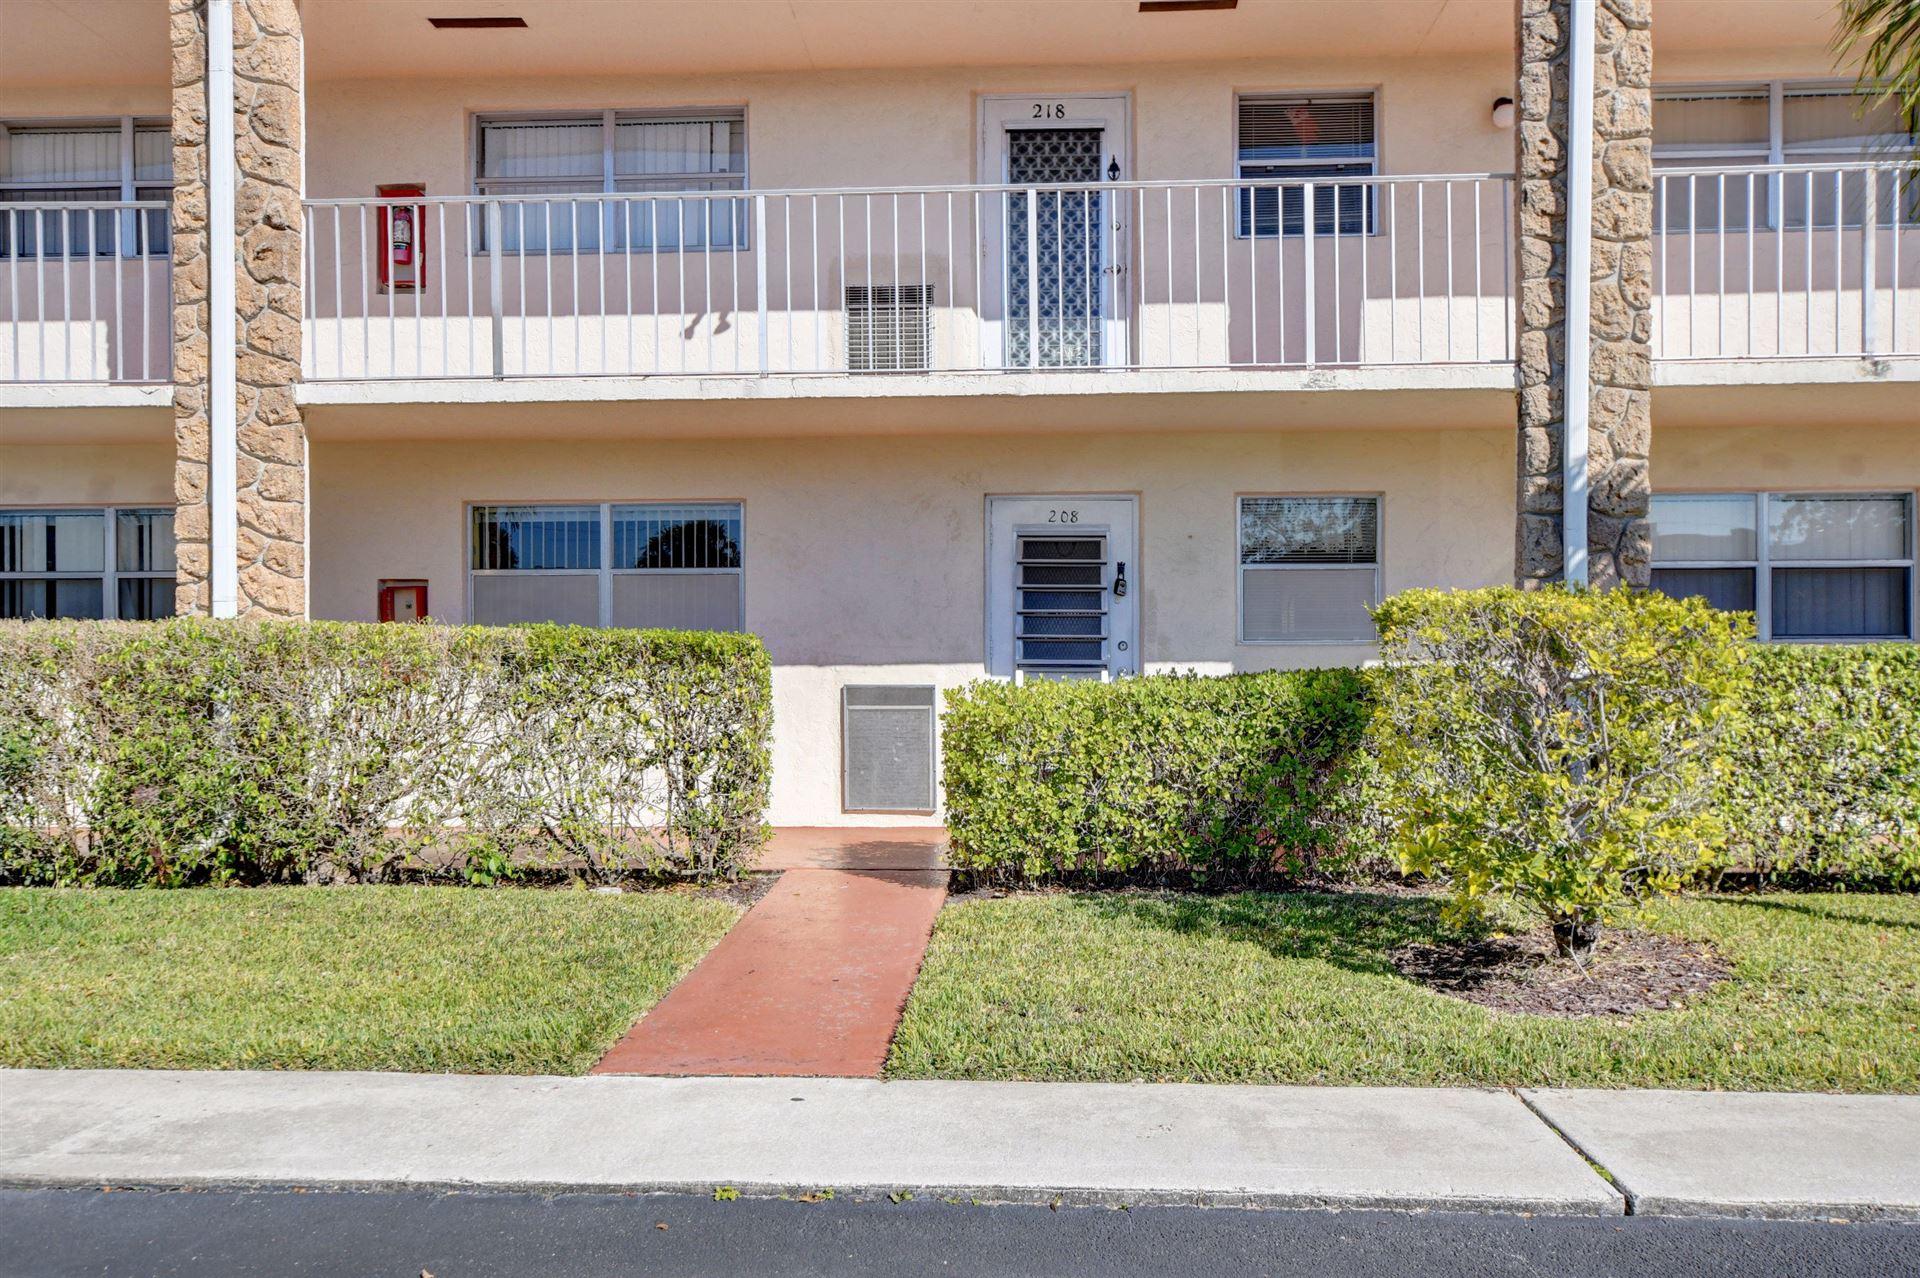 9851 Sandalfoot 208 Boulevard #208, Boca Raton, FL 33428 - #: RX-10689845